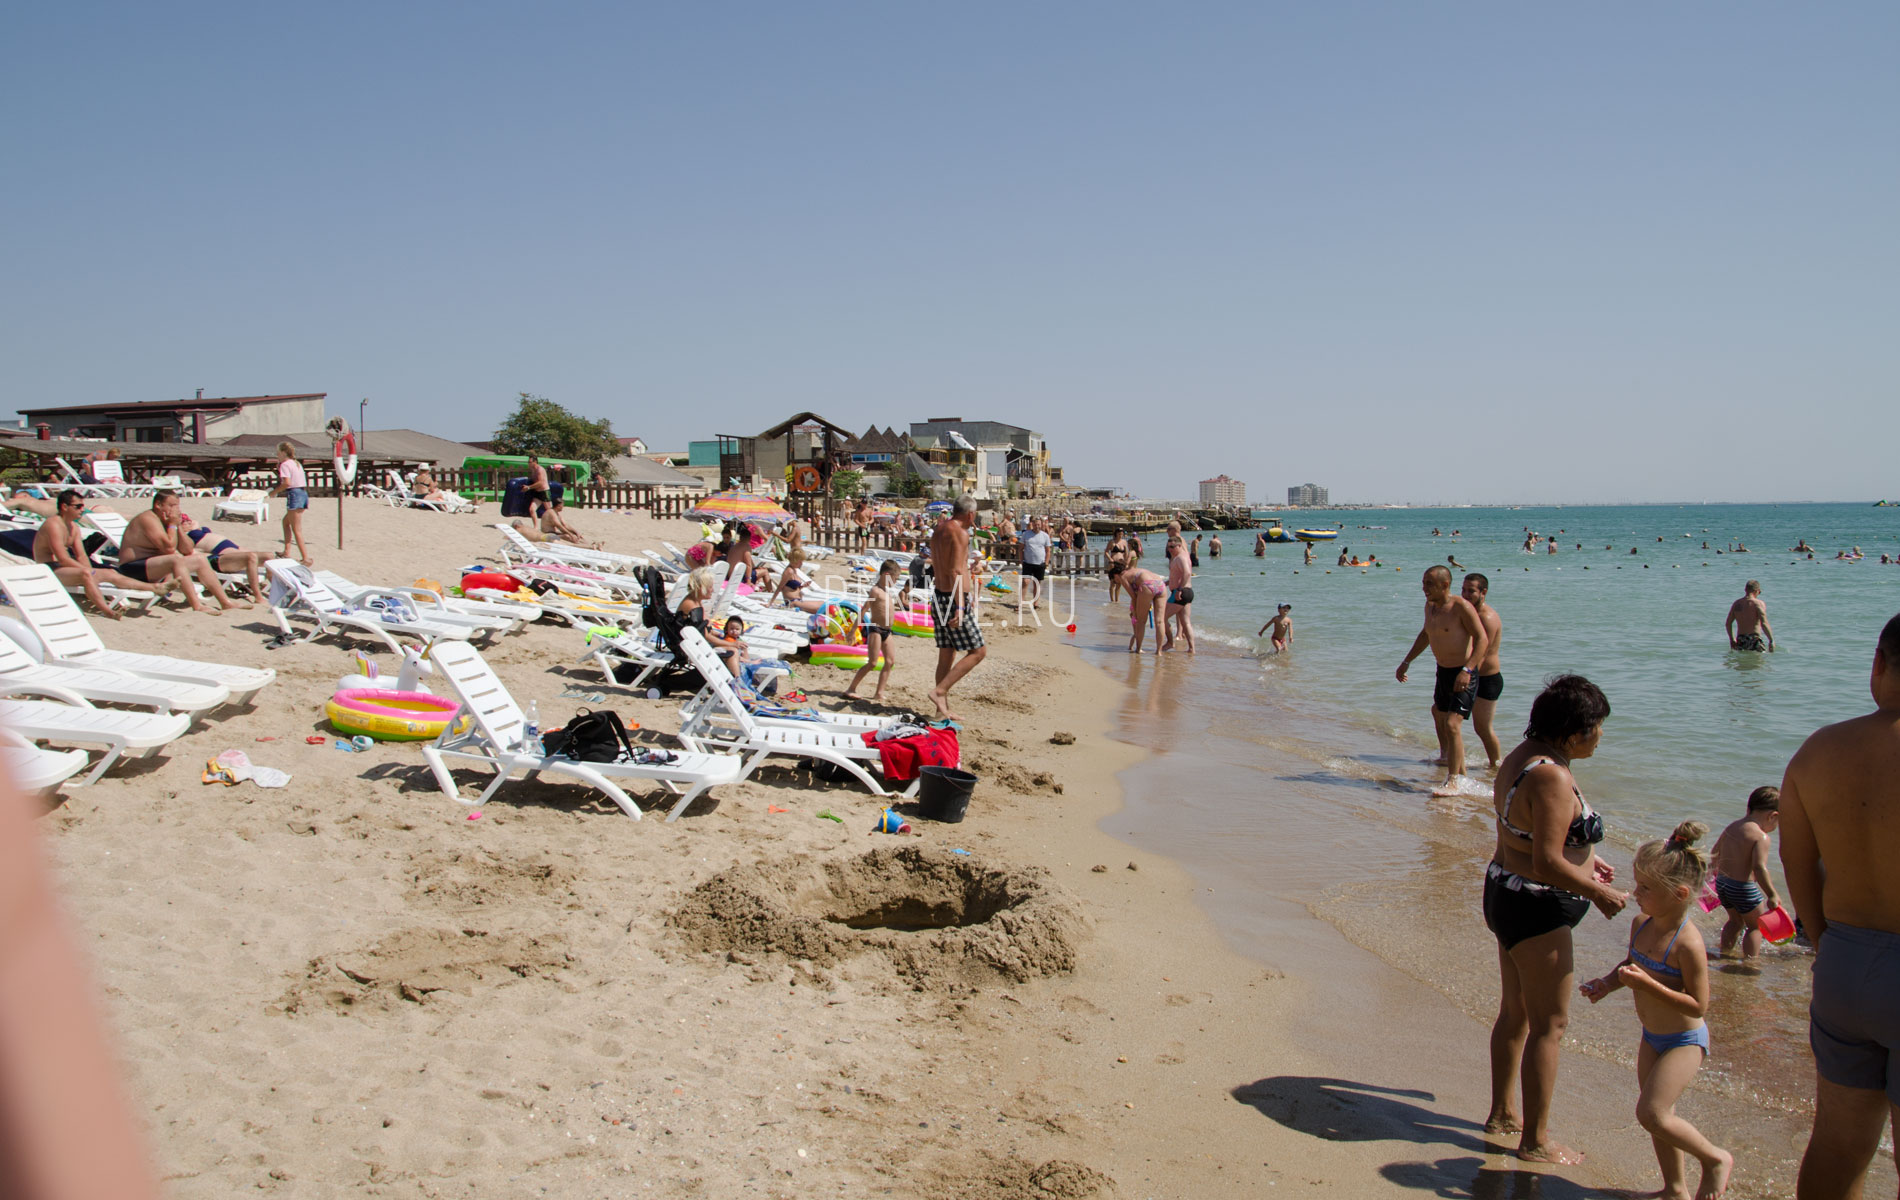 Пляж Оазис в Евпатории. Фото Евпатории